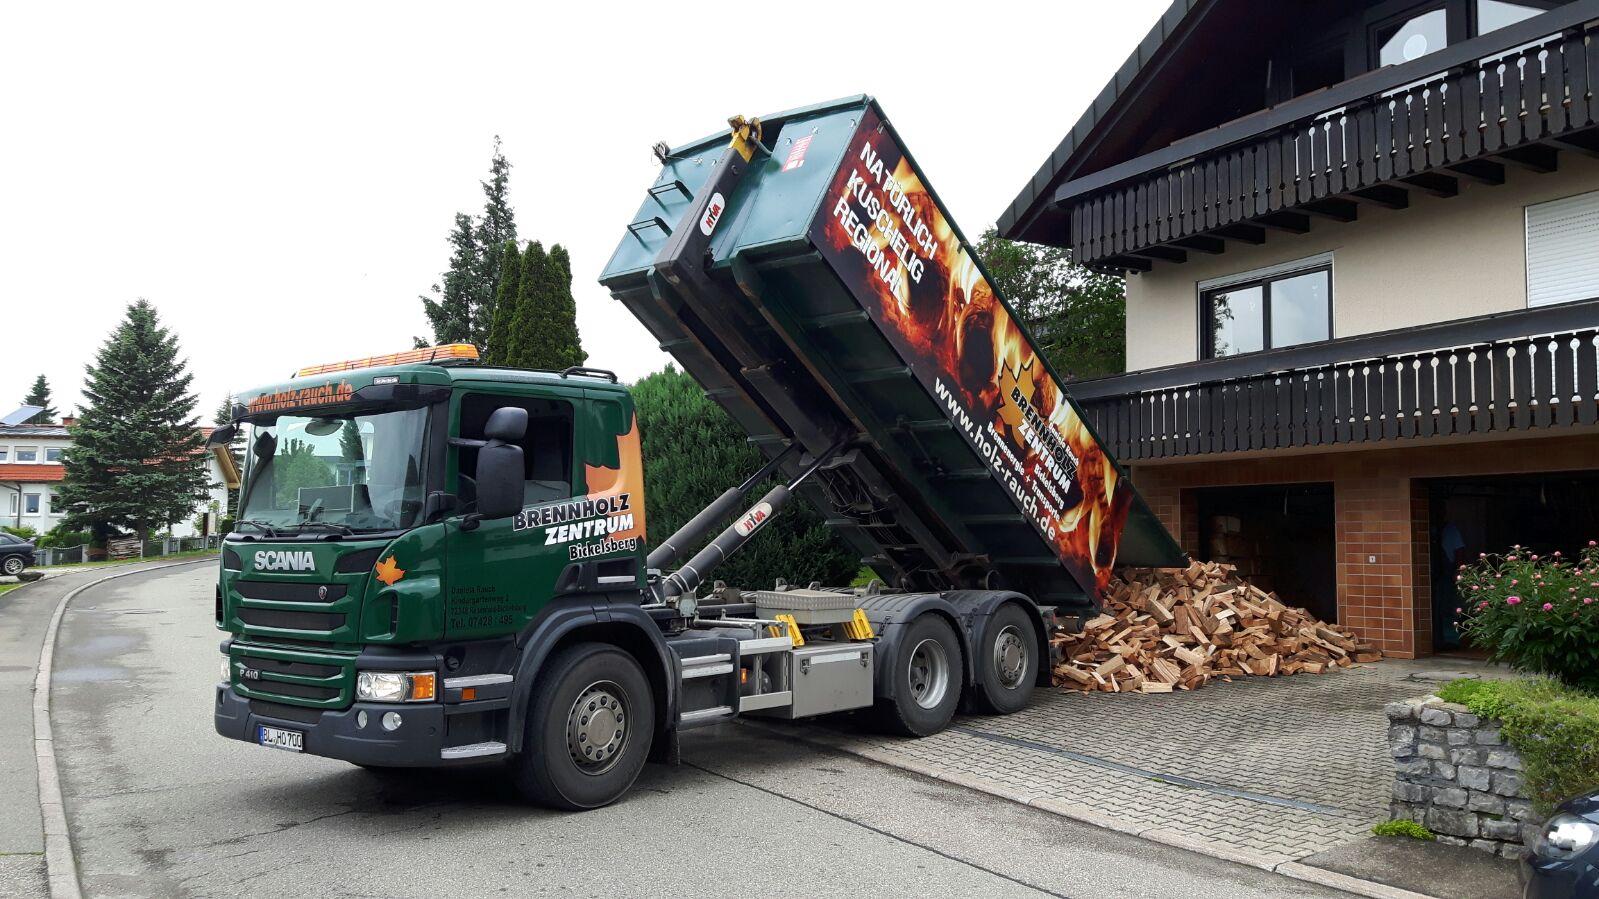 brennholz-lieferung